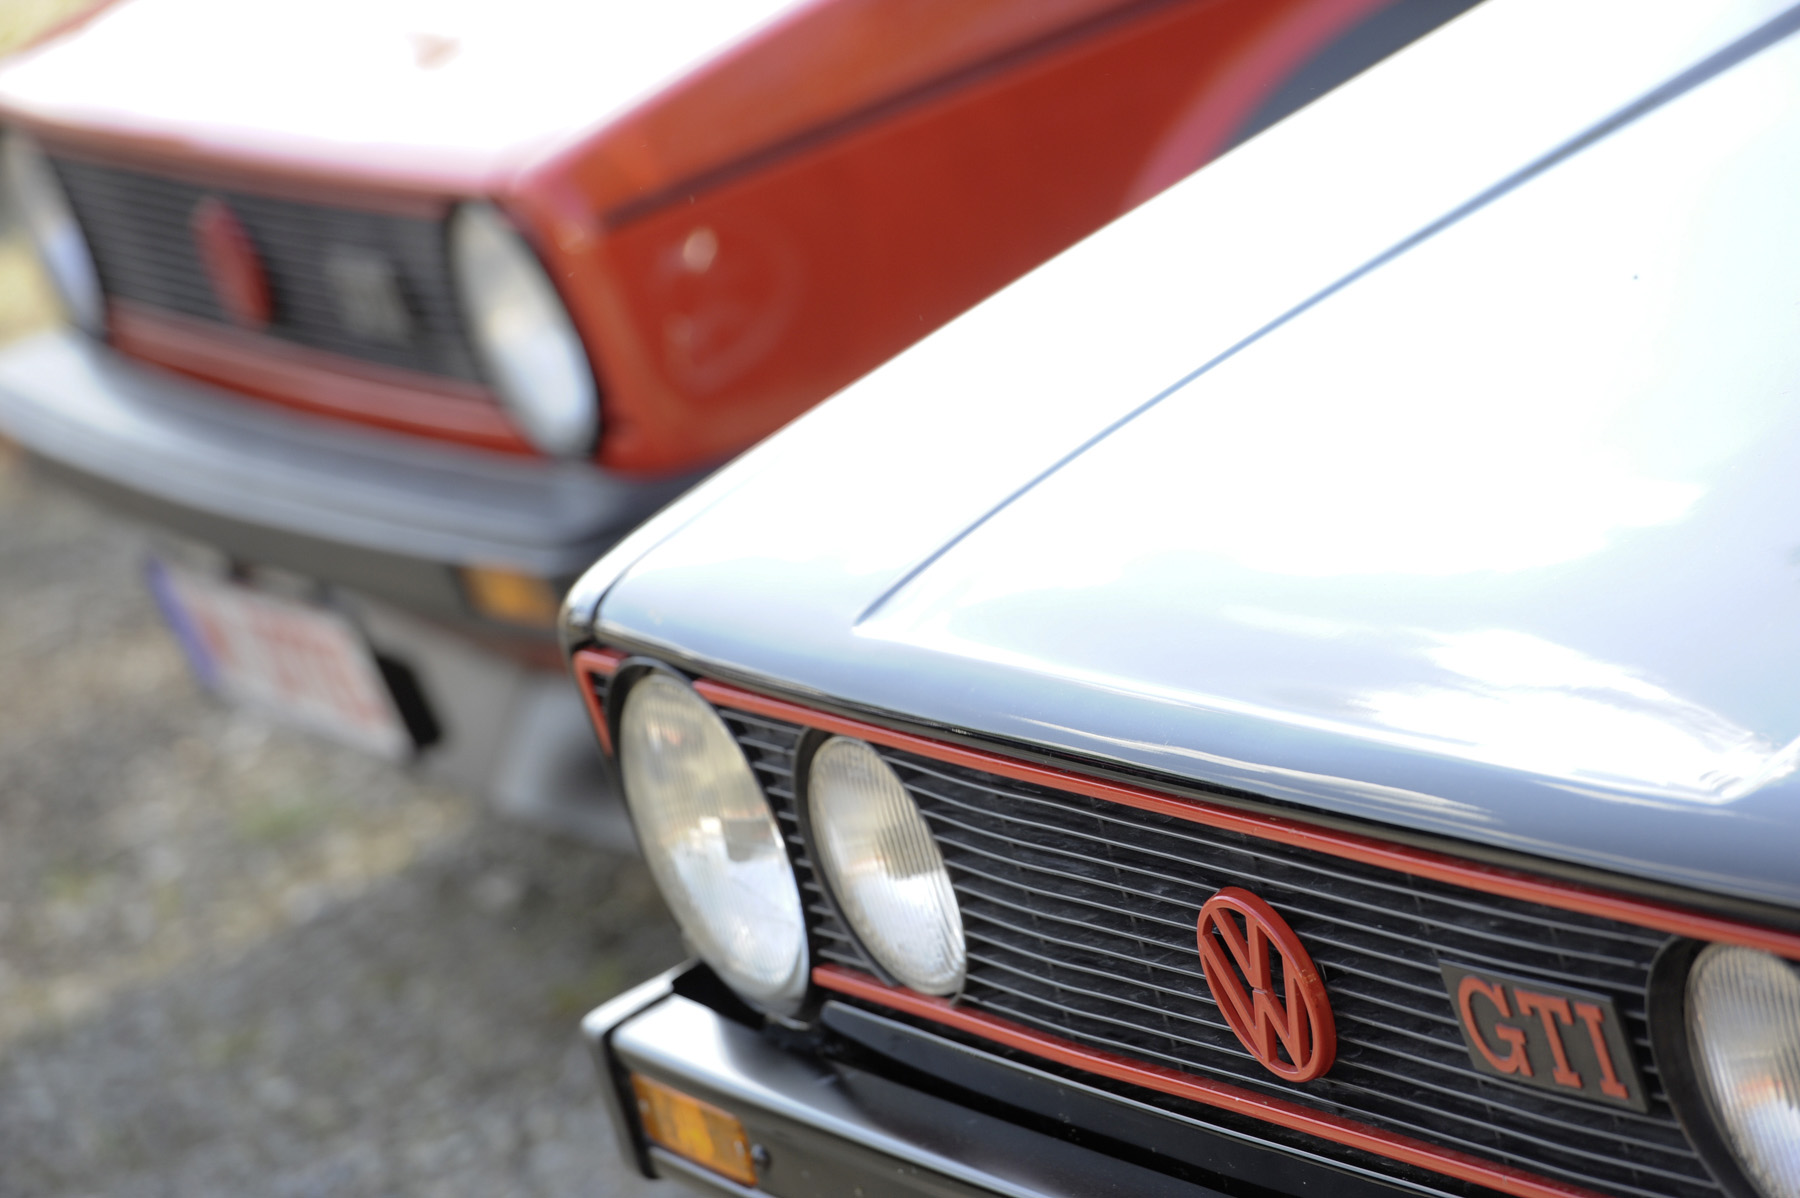 1988 VW Volkswagen GTI emblem grill